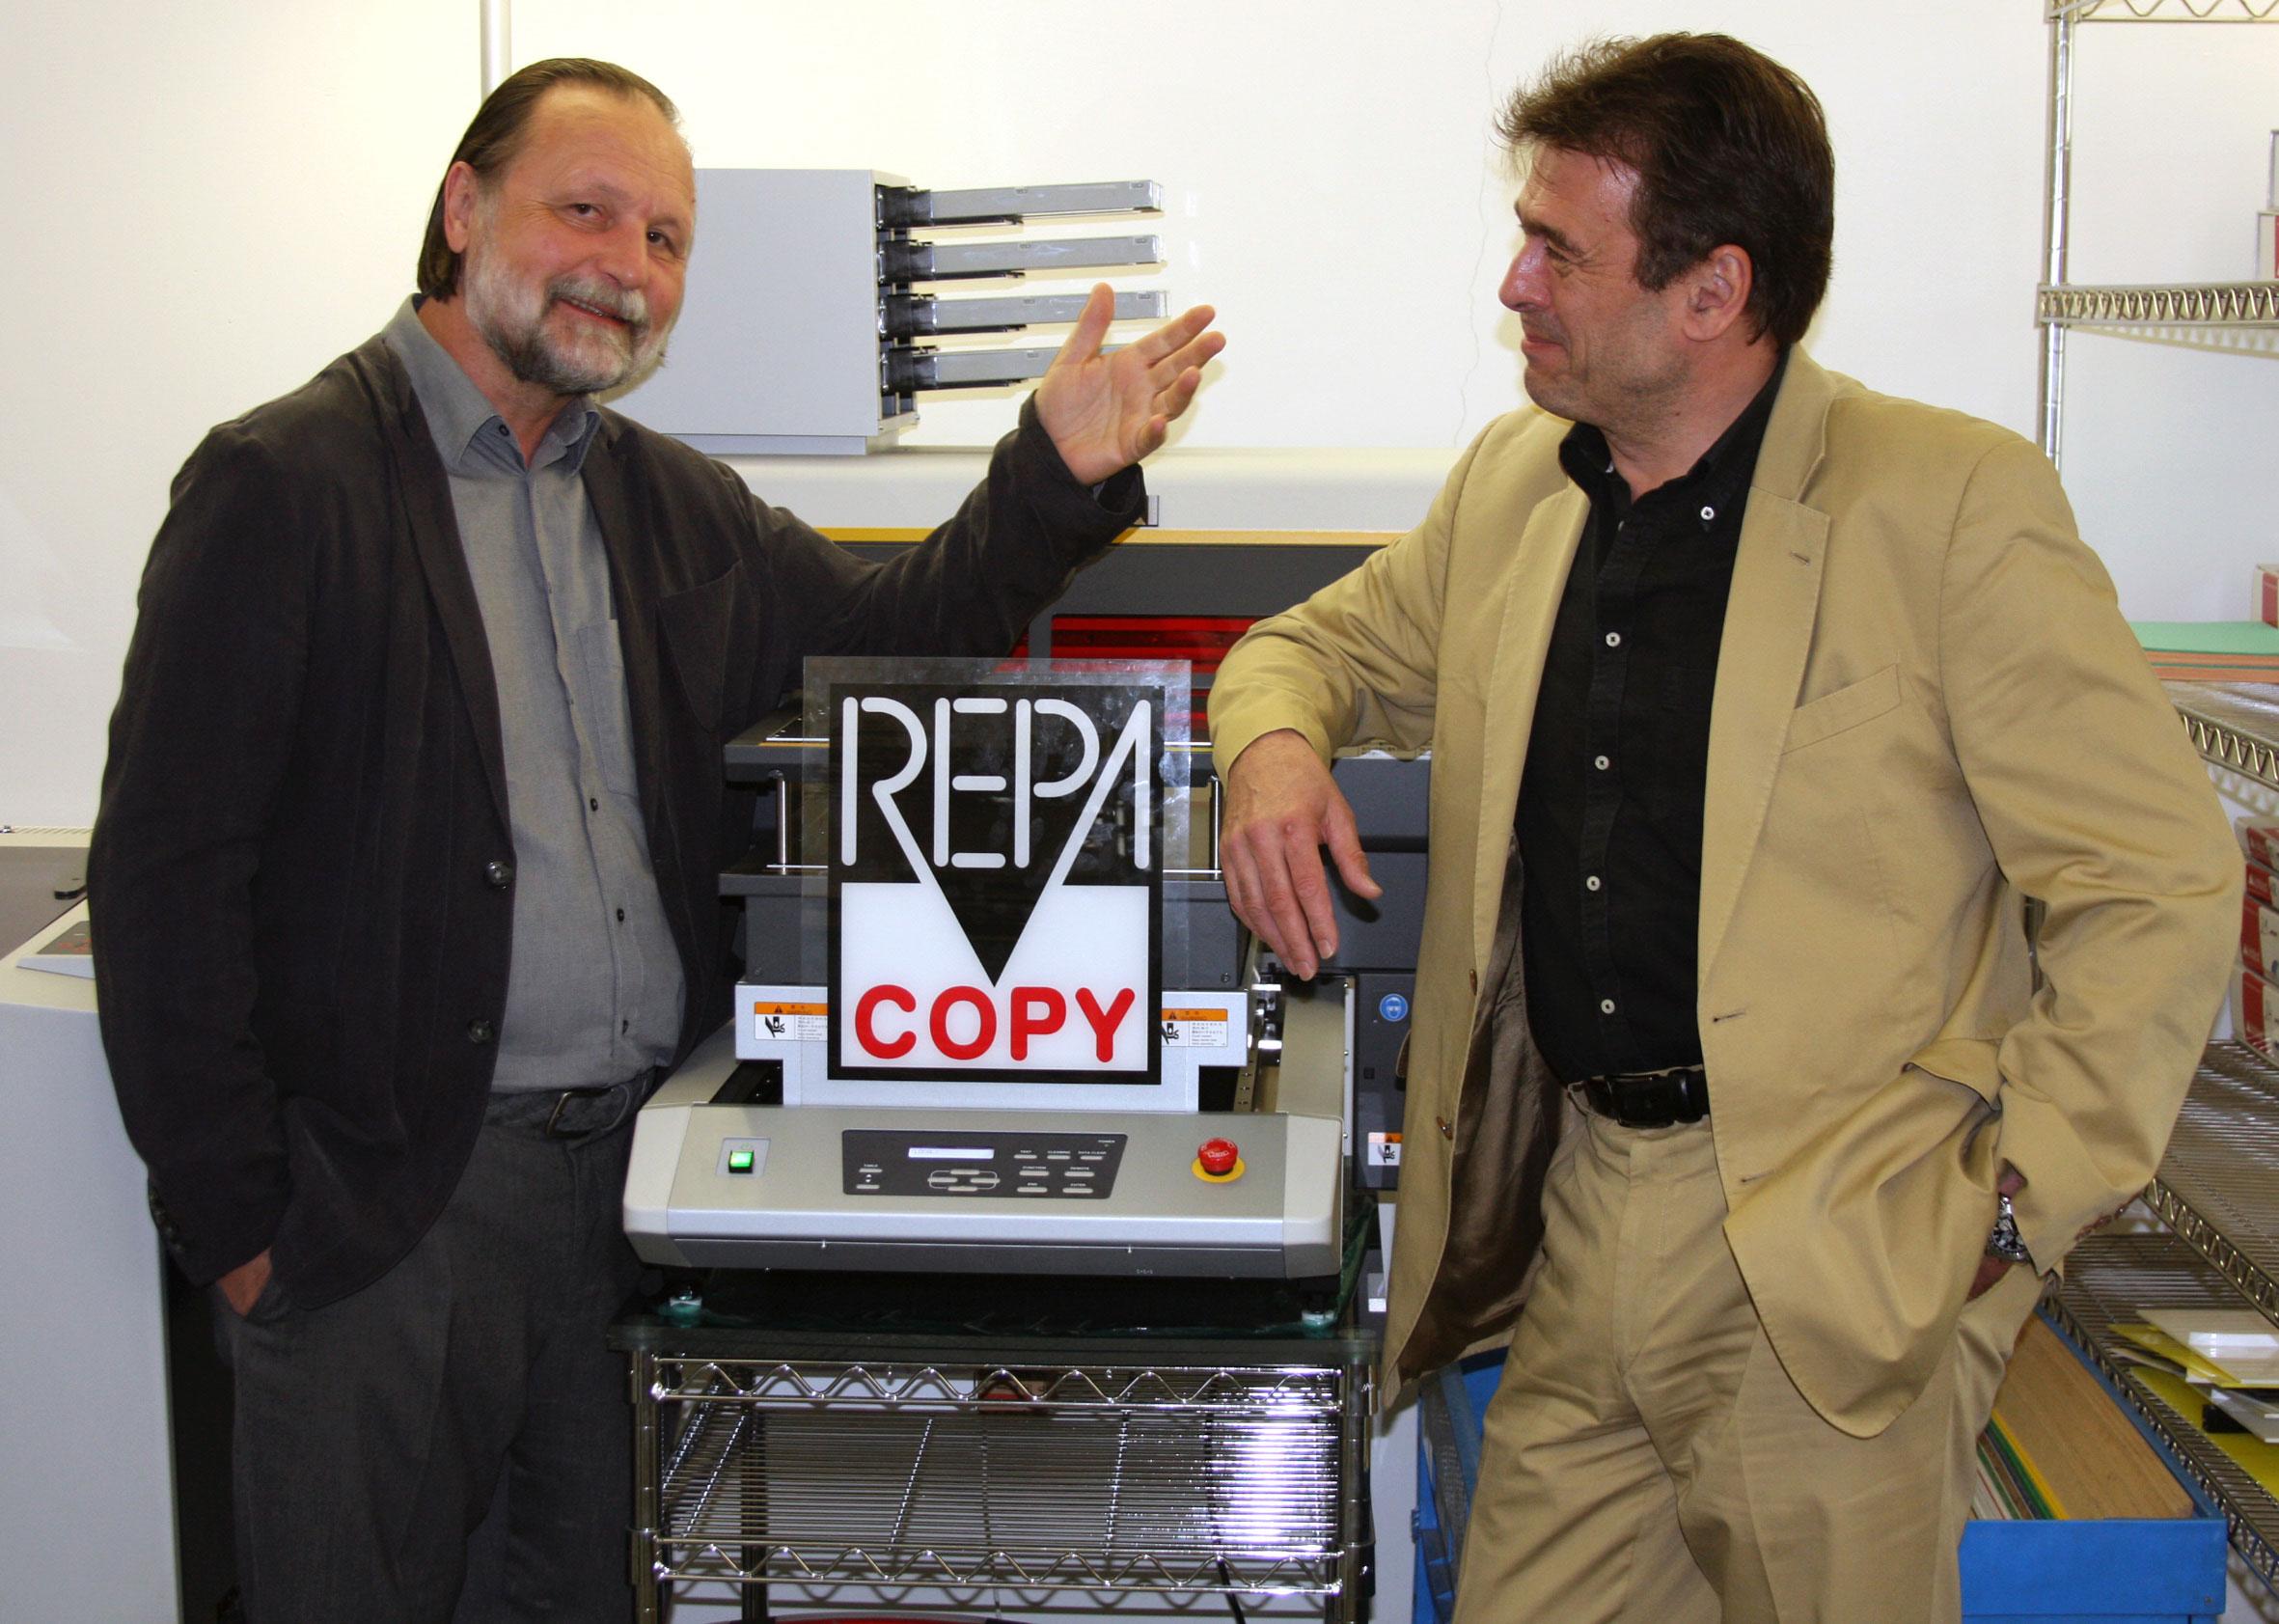 repa-copy